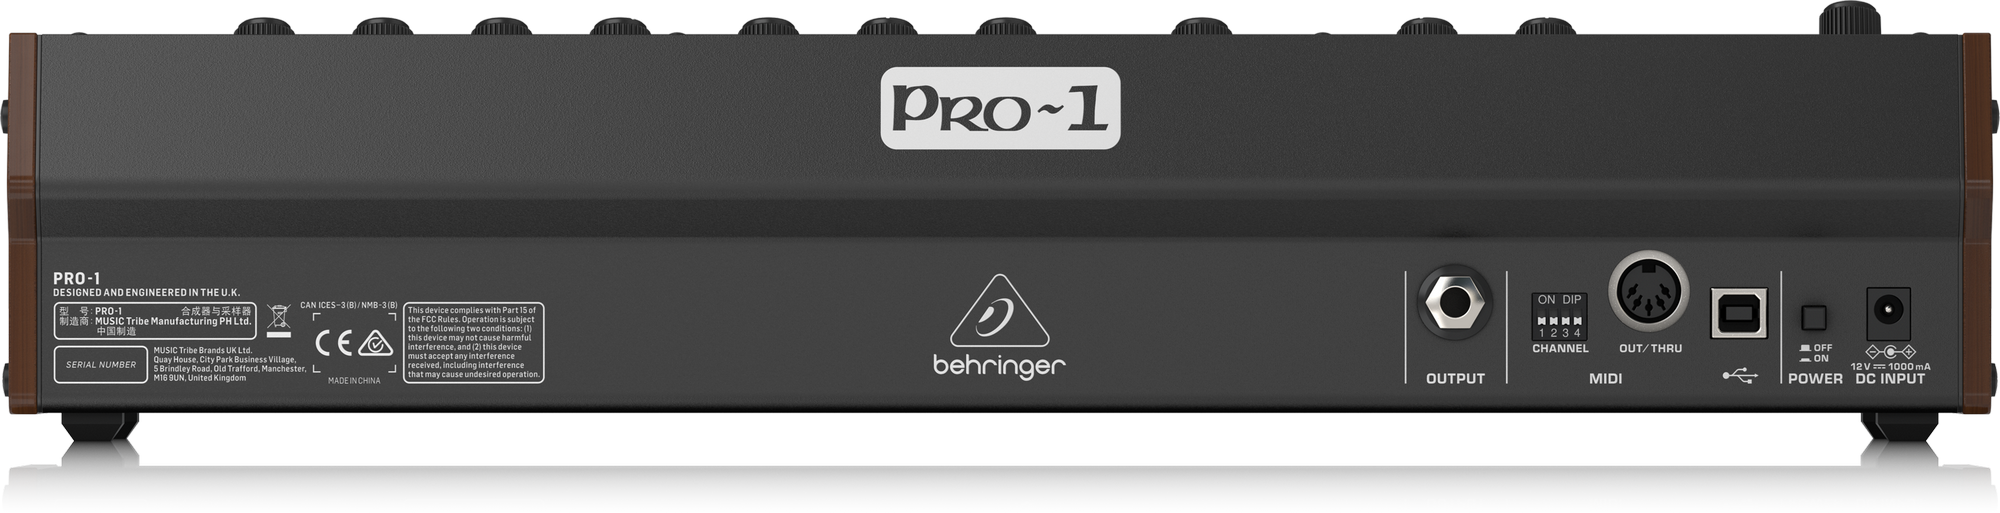 Behringer PRO-1 - Synthétiseurs analogiques